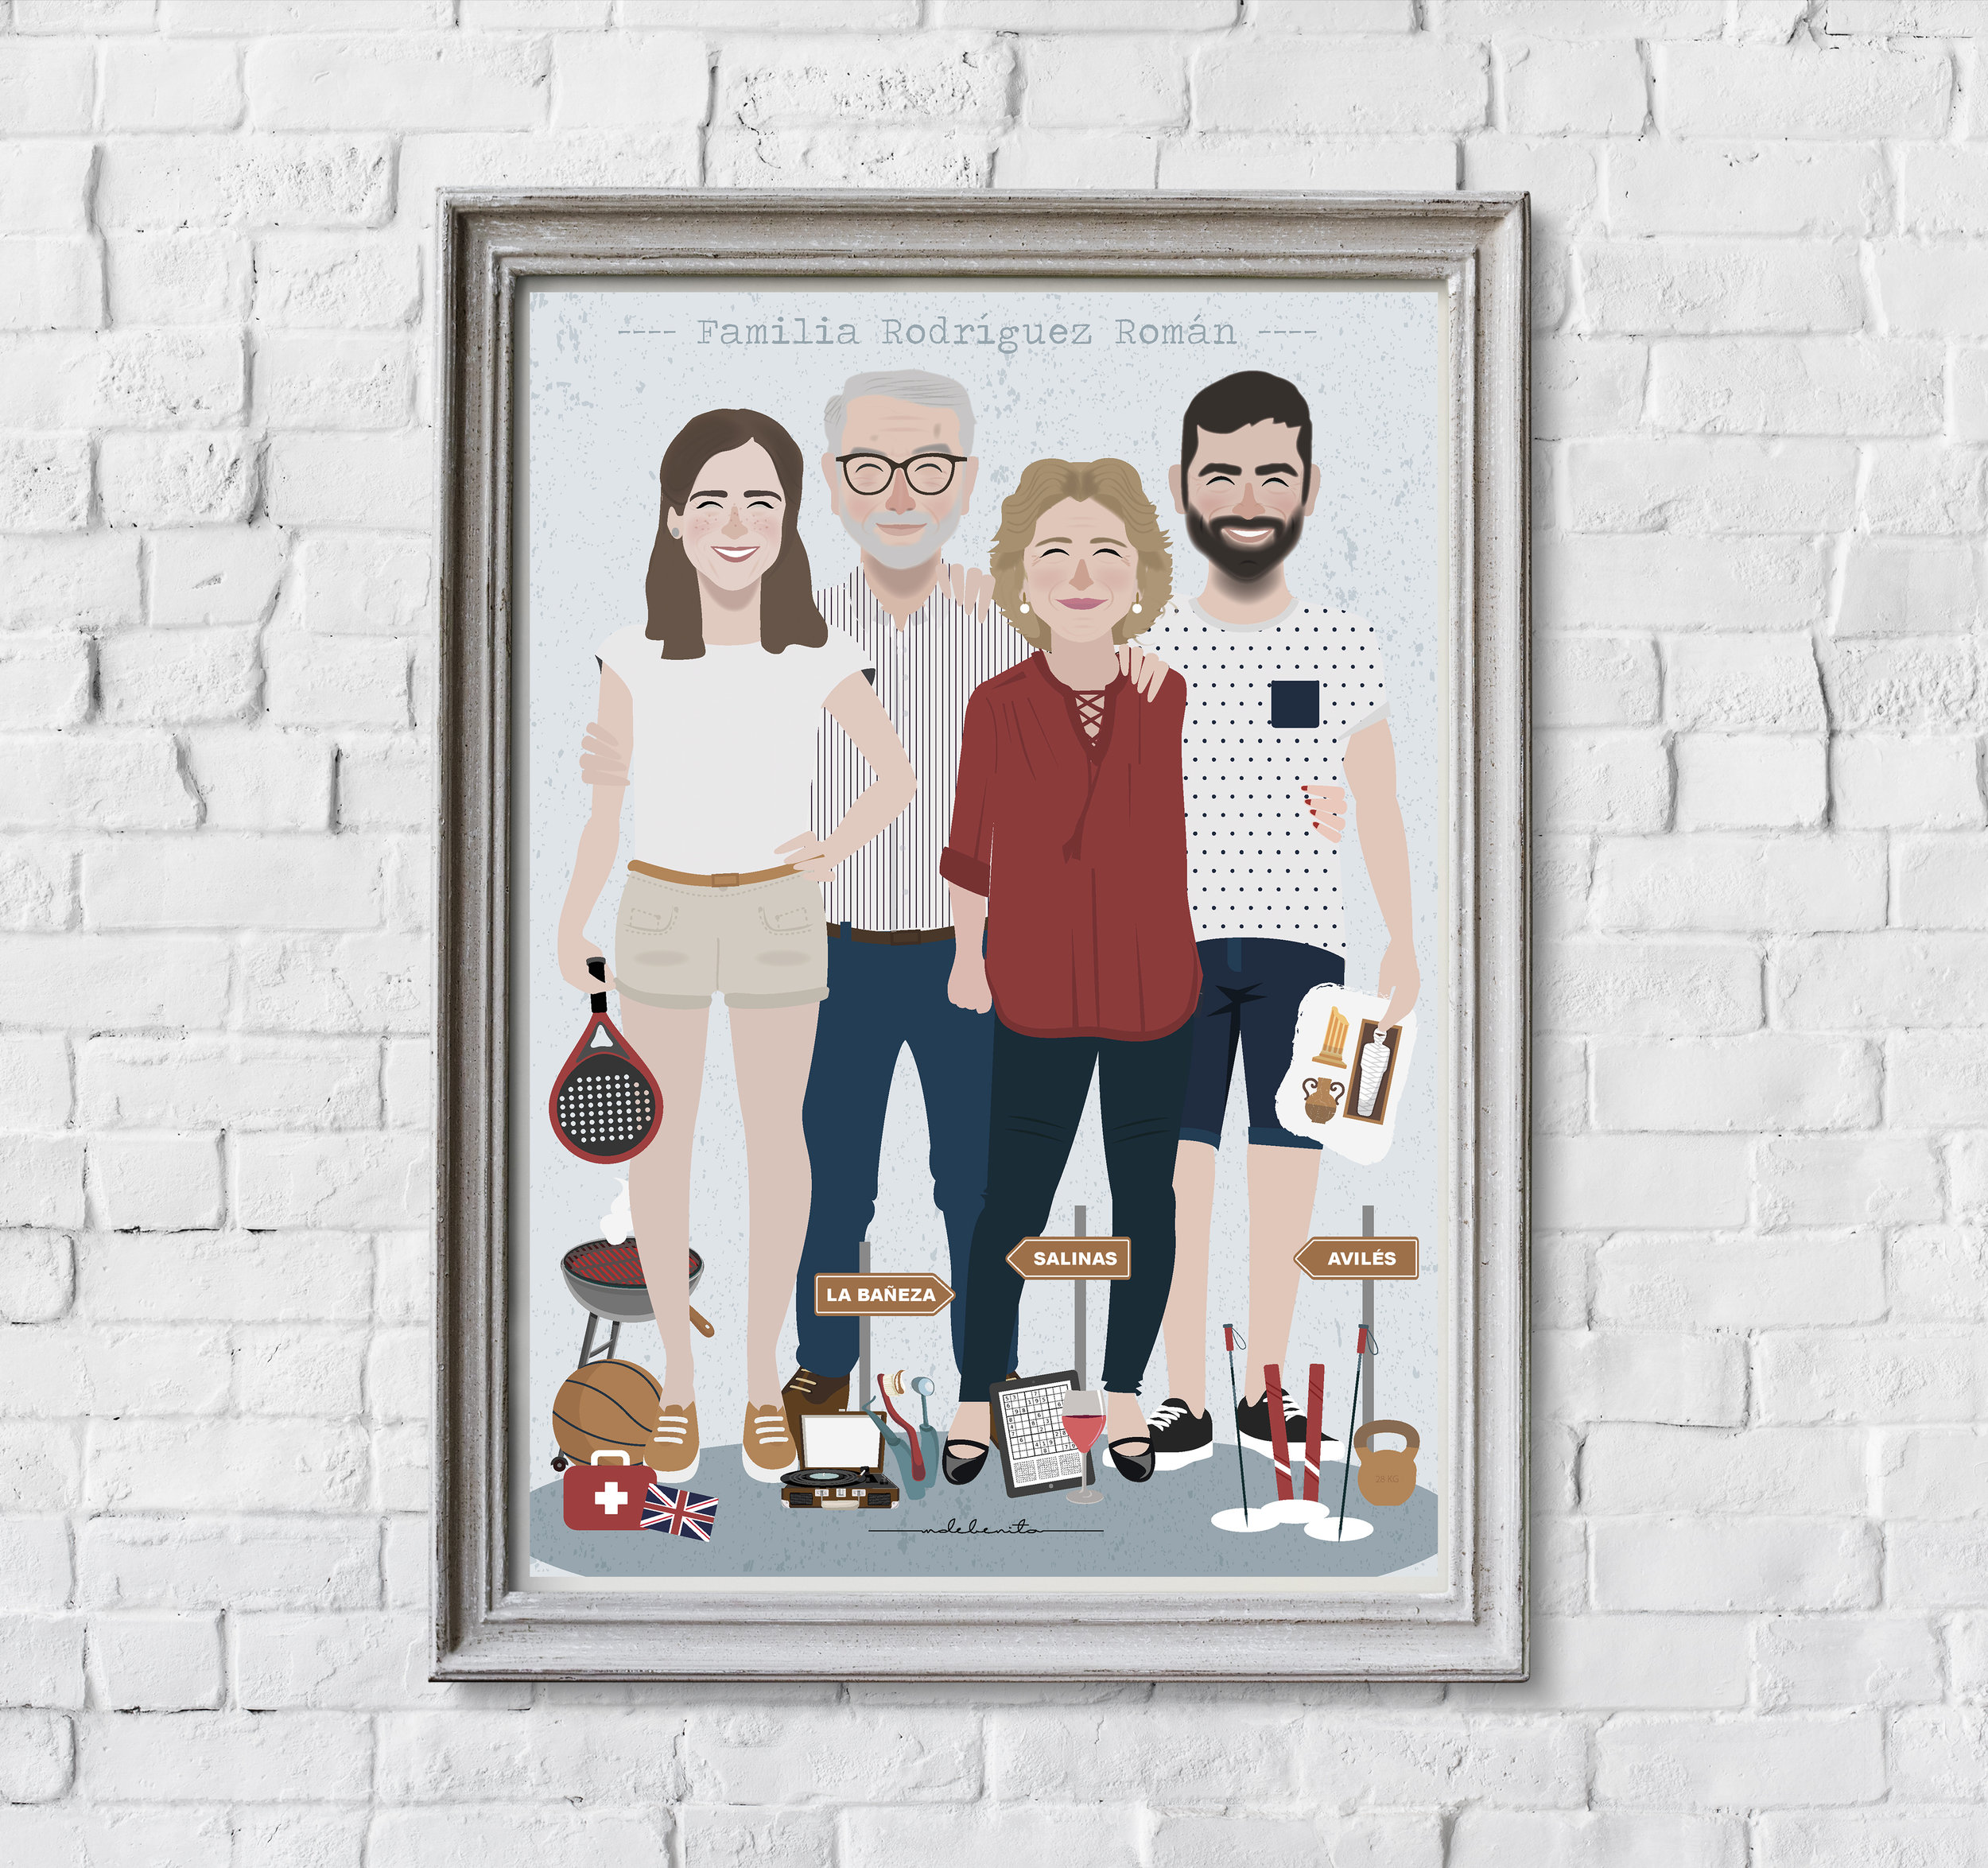 ilustracionpersonalizada-regalo-original-familia-boda-diseño-grafico-asturias-mdebenito.jpg